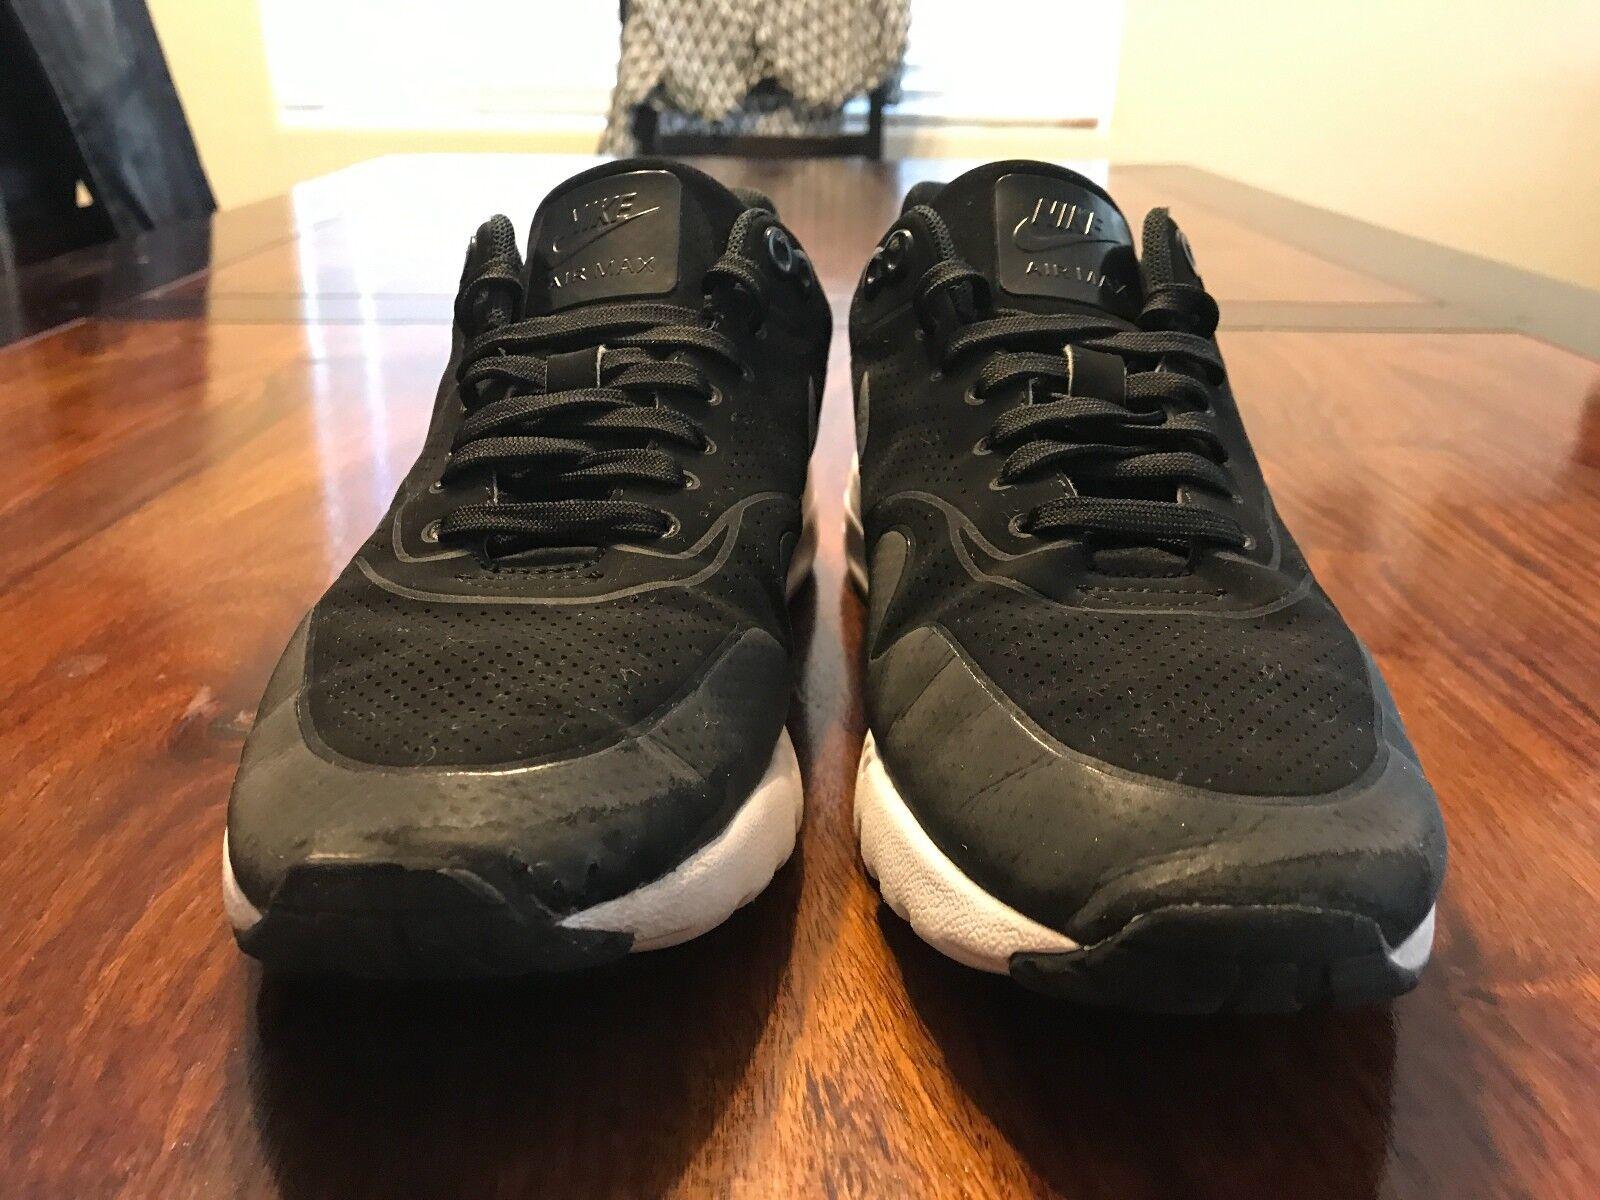 femmes Nike Air Max Chaussures 1 Ultra Moire Running Chaussures Max 5df7b6